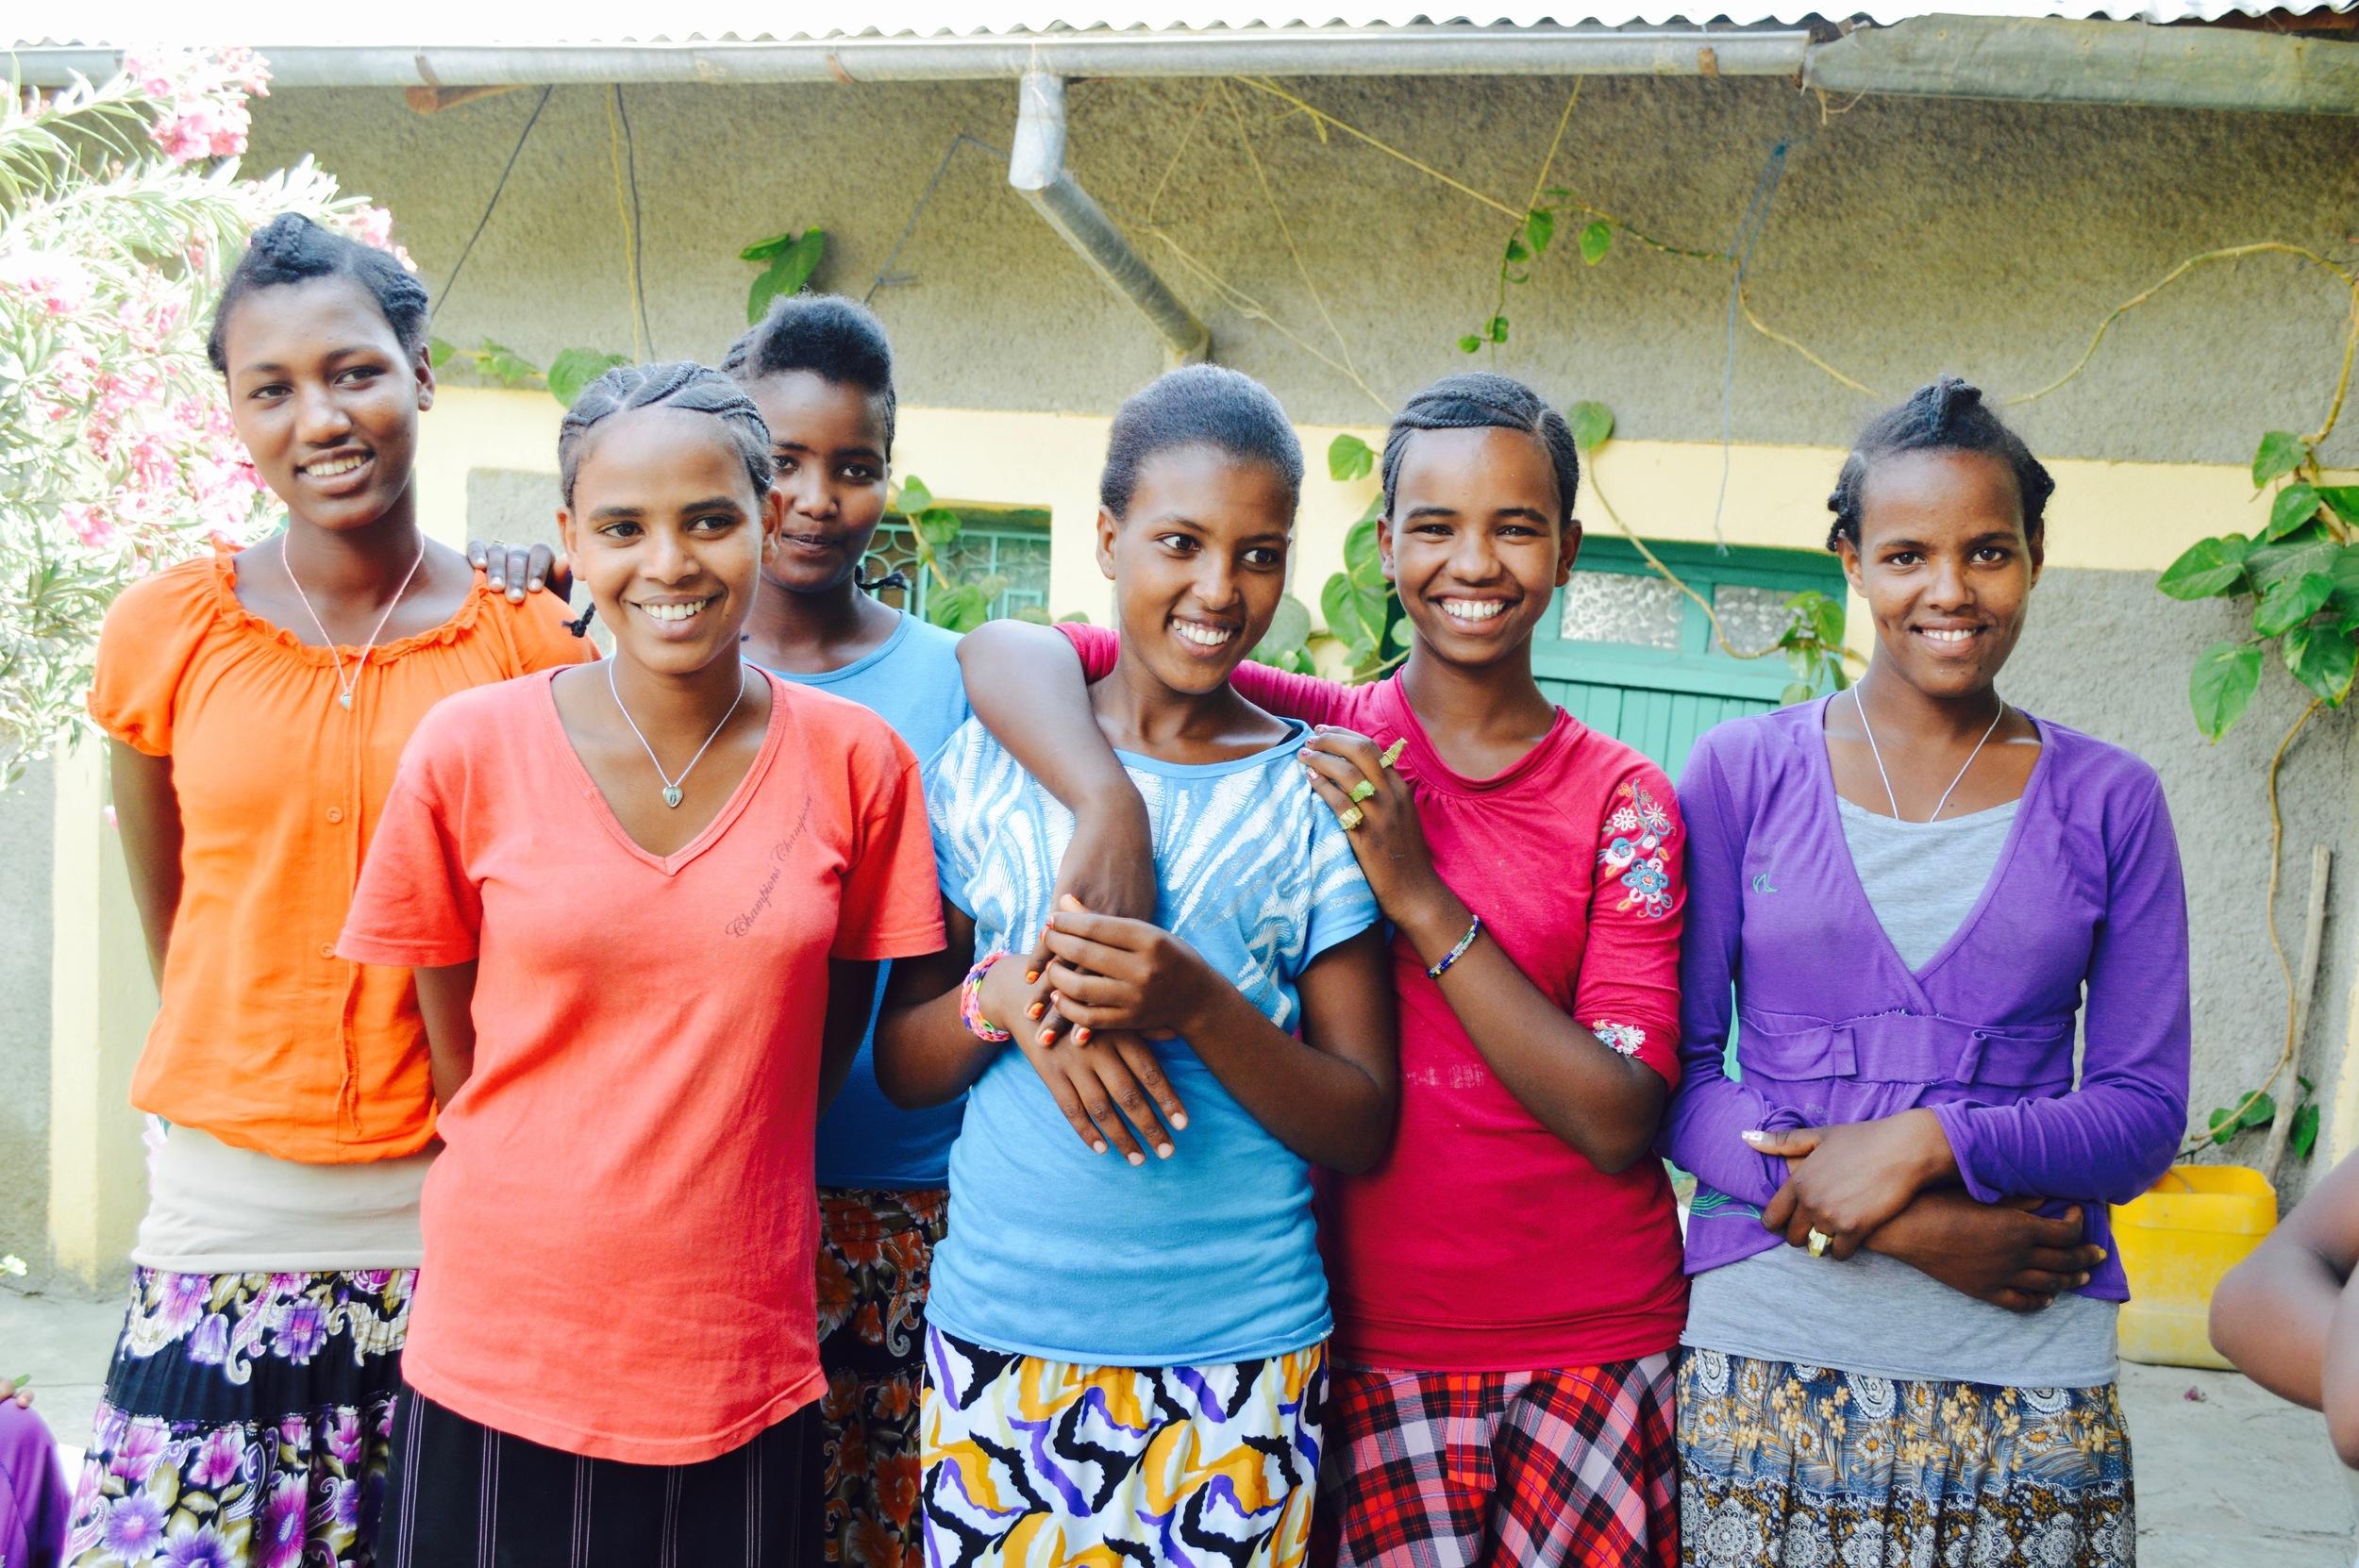 Lideta Secondary High School - Alitena   7th -10th Grade  171 Students  Number of teachers: 7  Cost per student: $106/£81